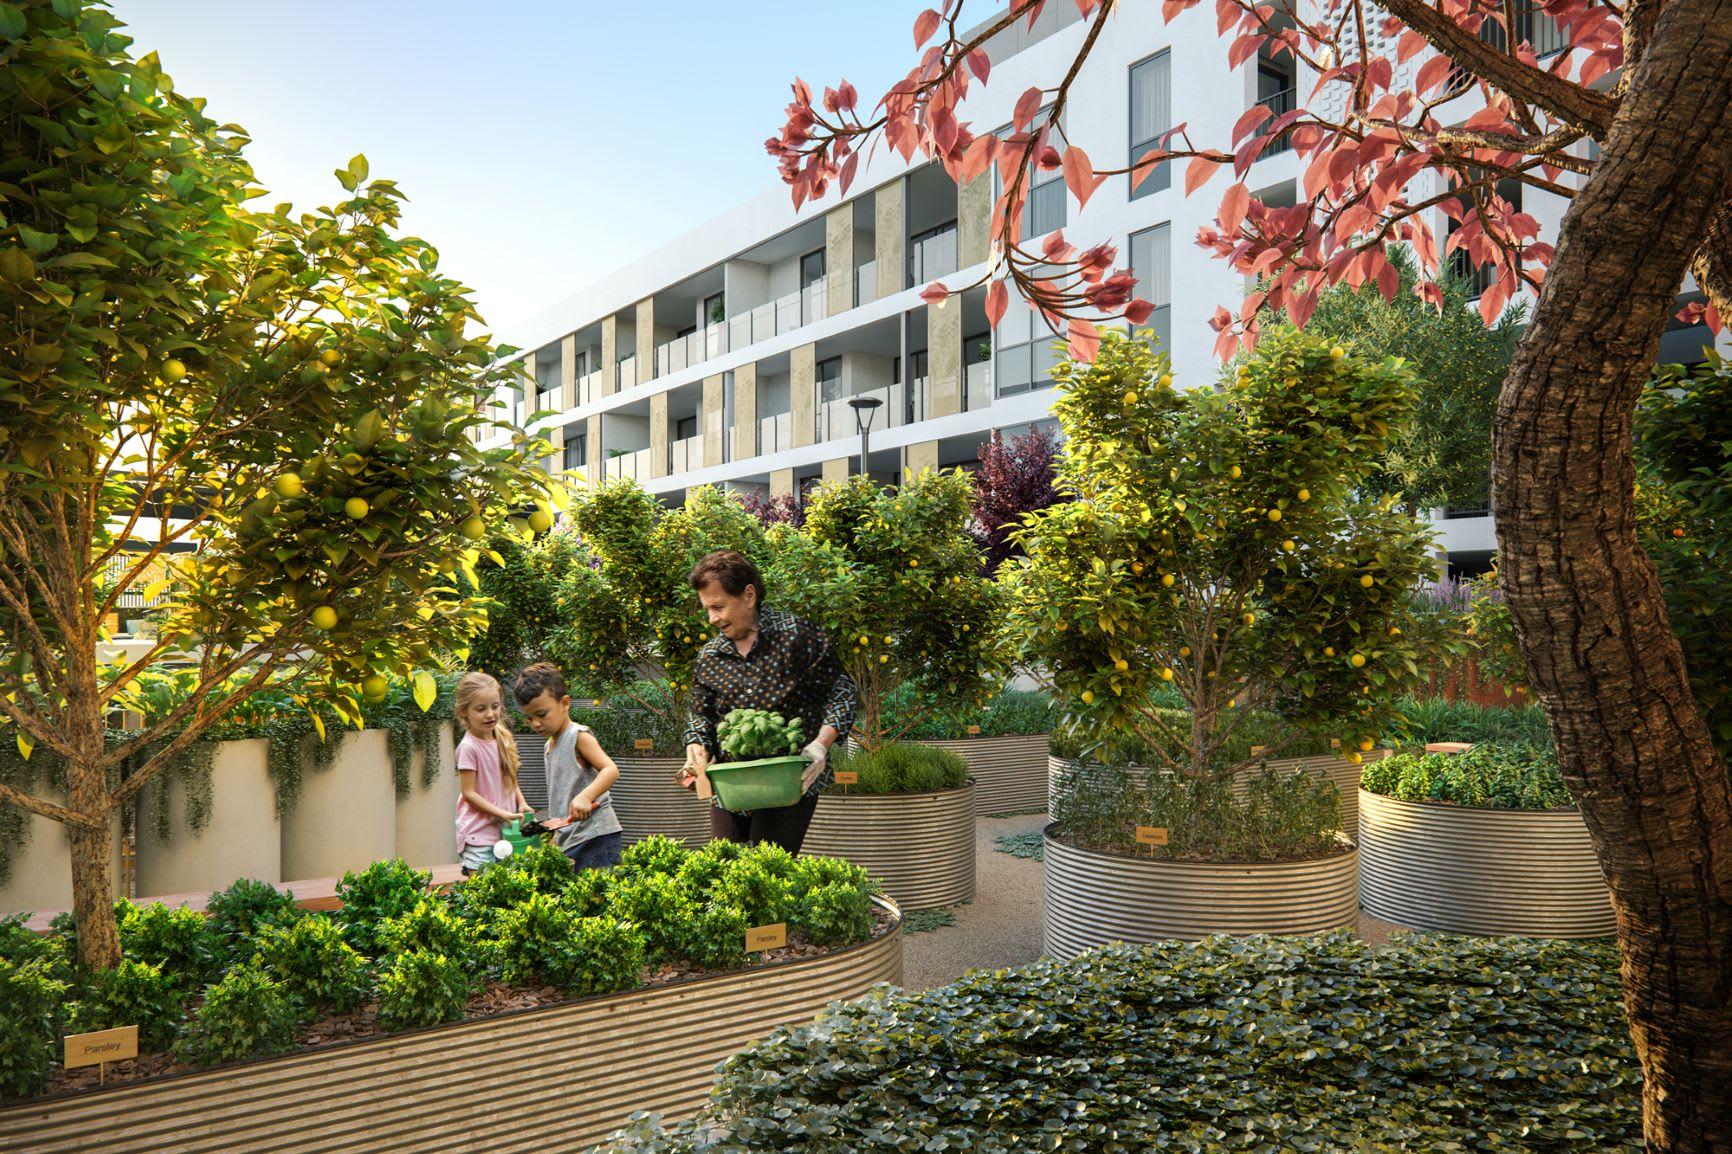 Design brief: Design scheme options for Shenton Quarter, Shenton Park apartment buyers